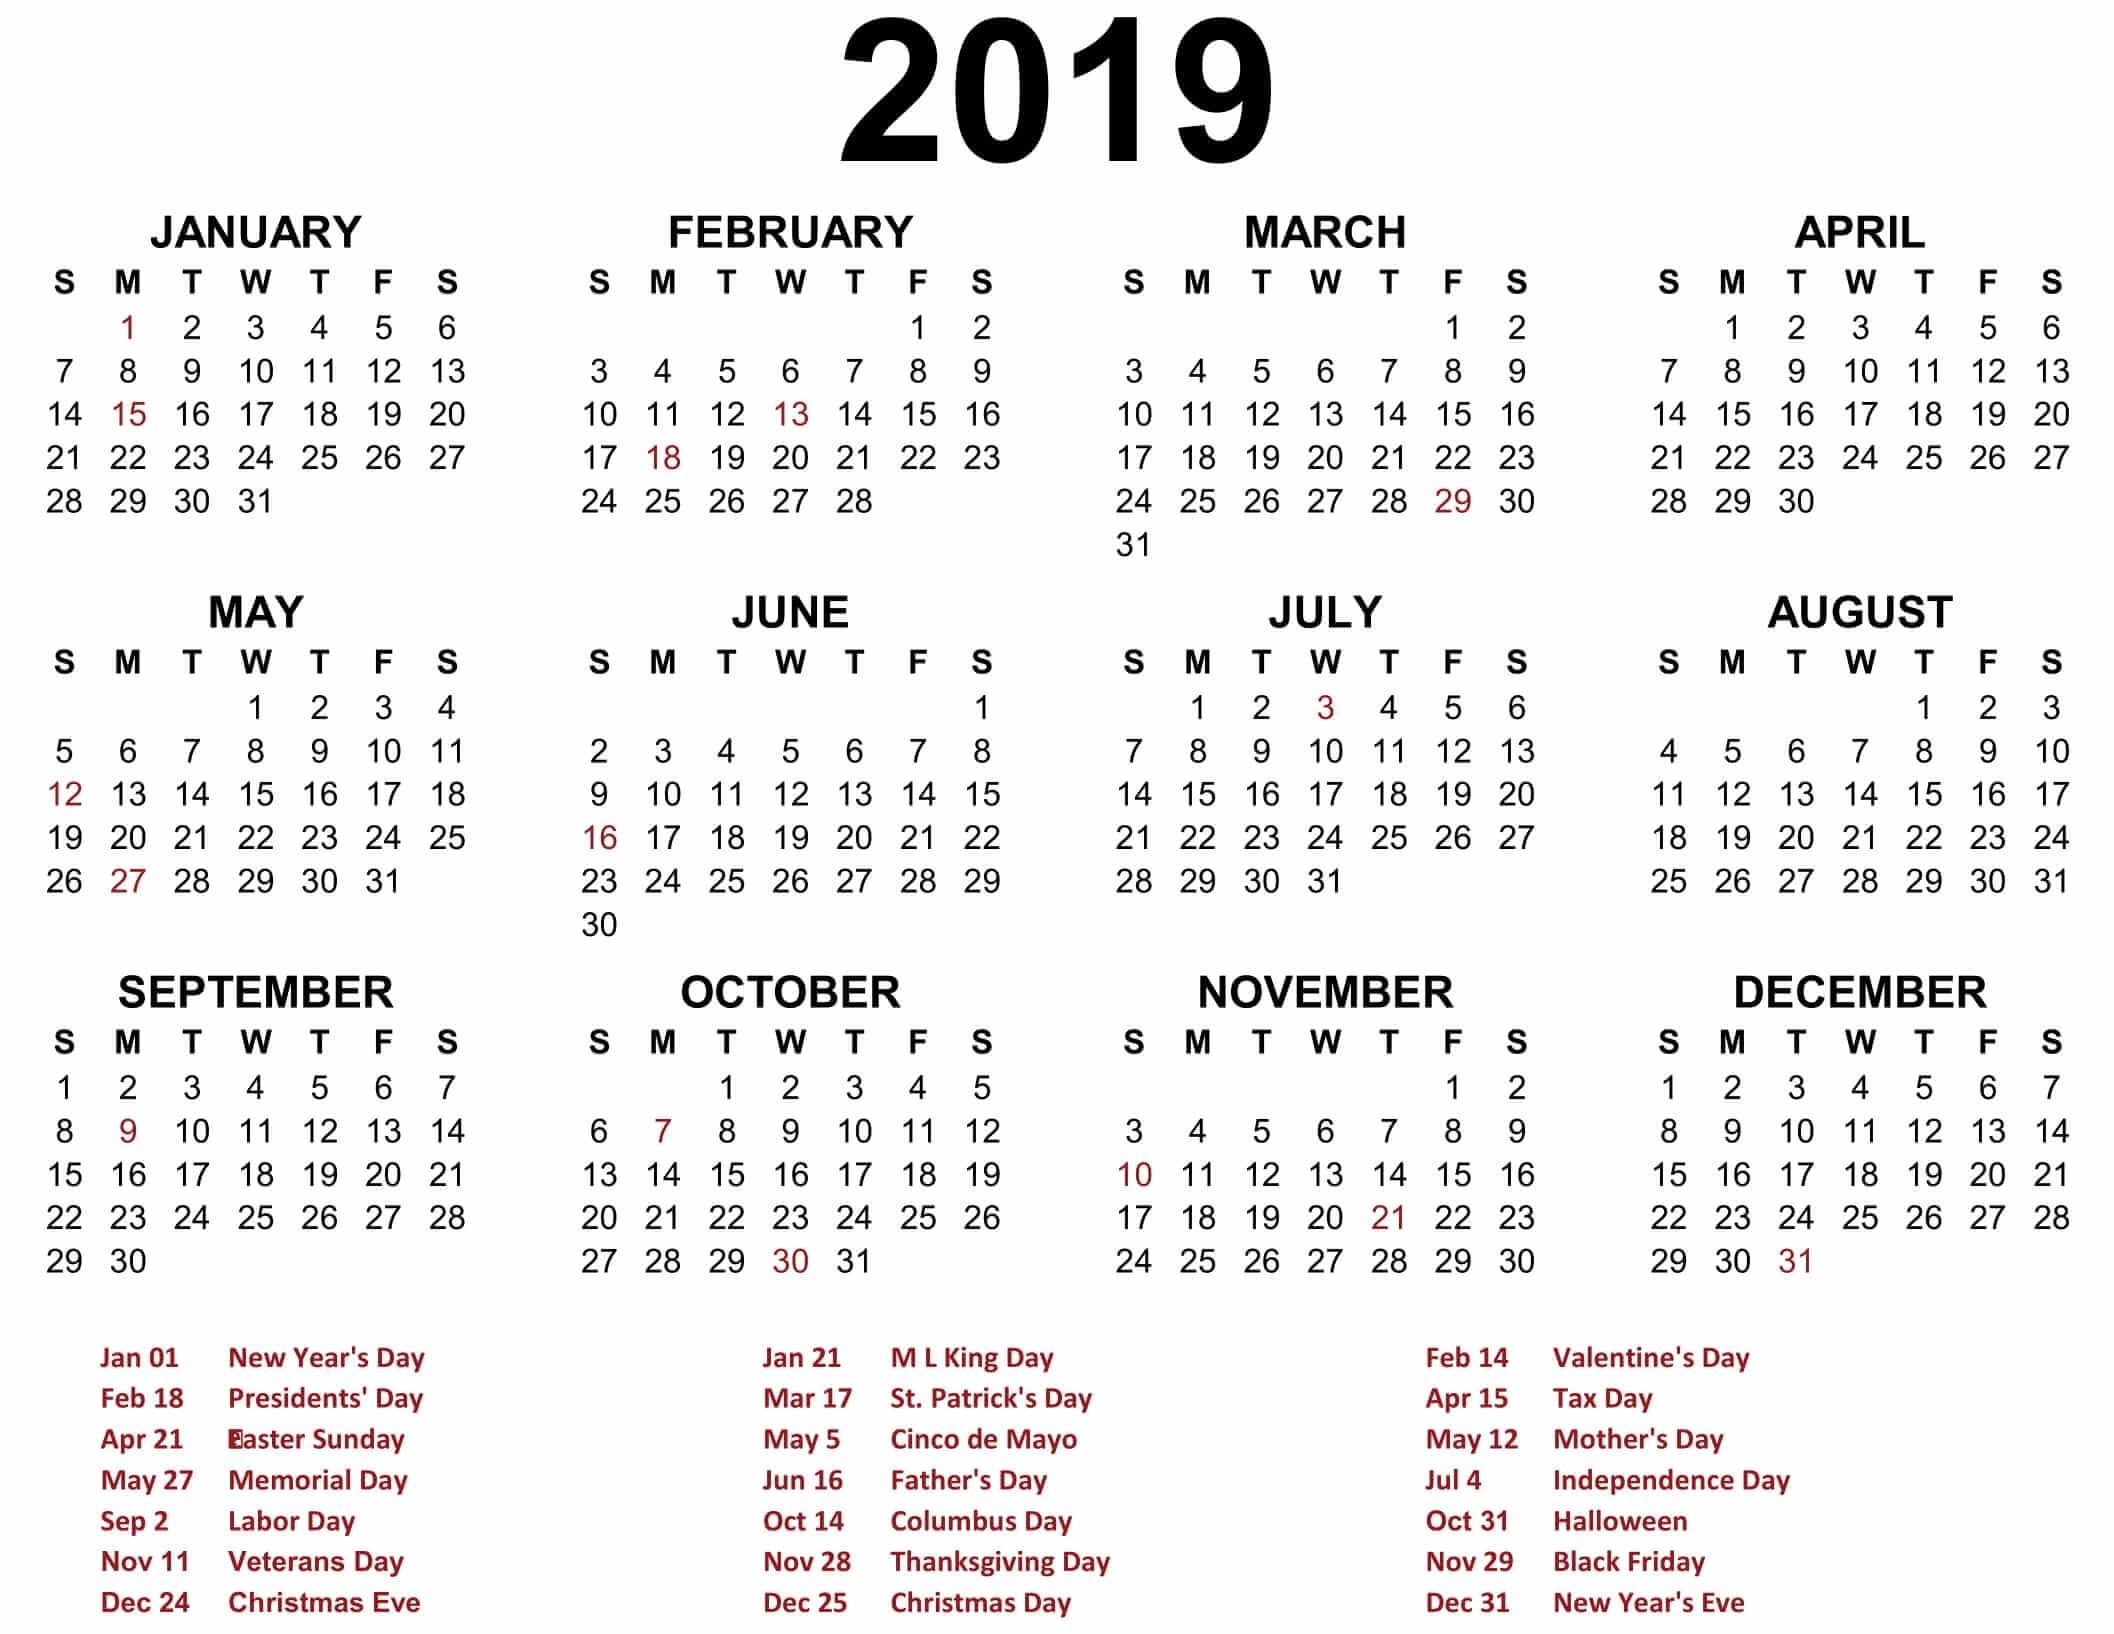 Printable Blank 2019 Calendar Templates - Calenndar 2019 Calendars